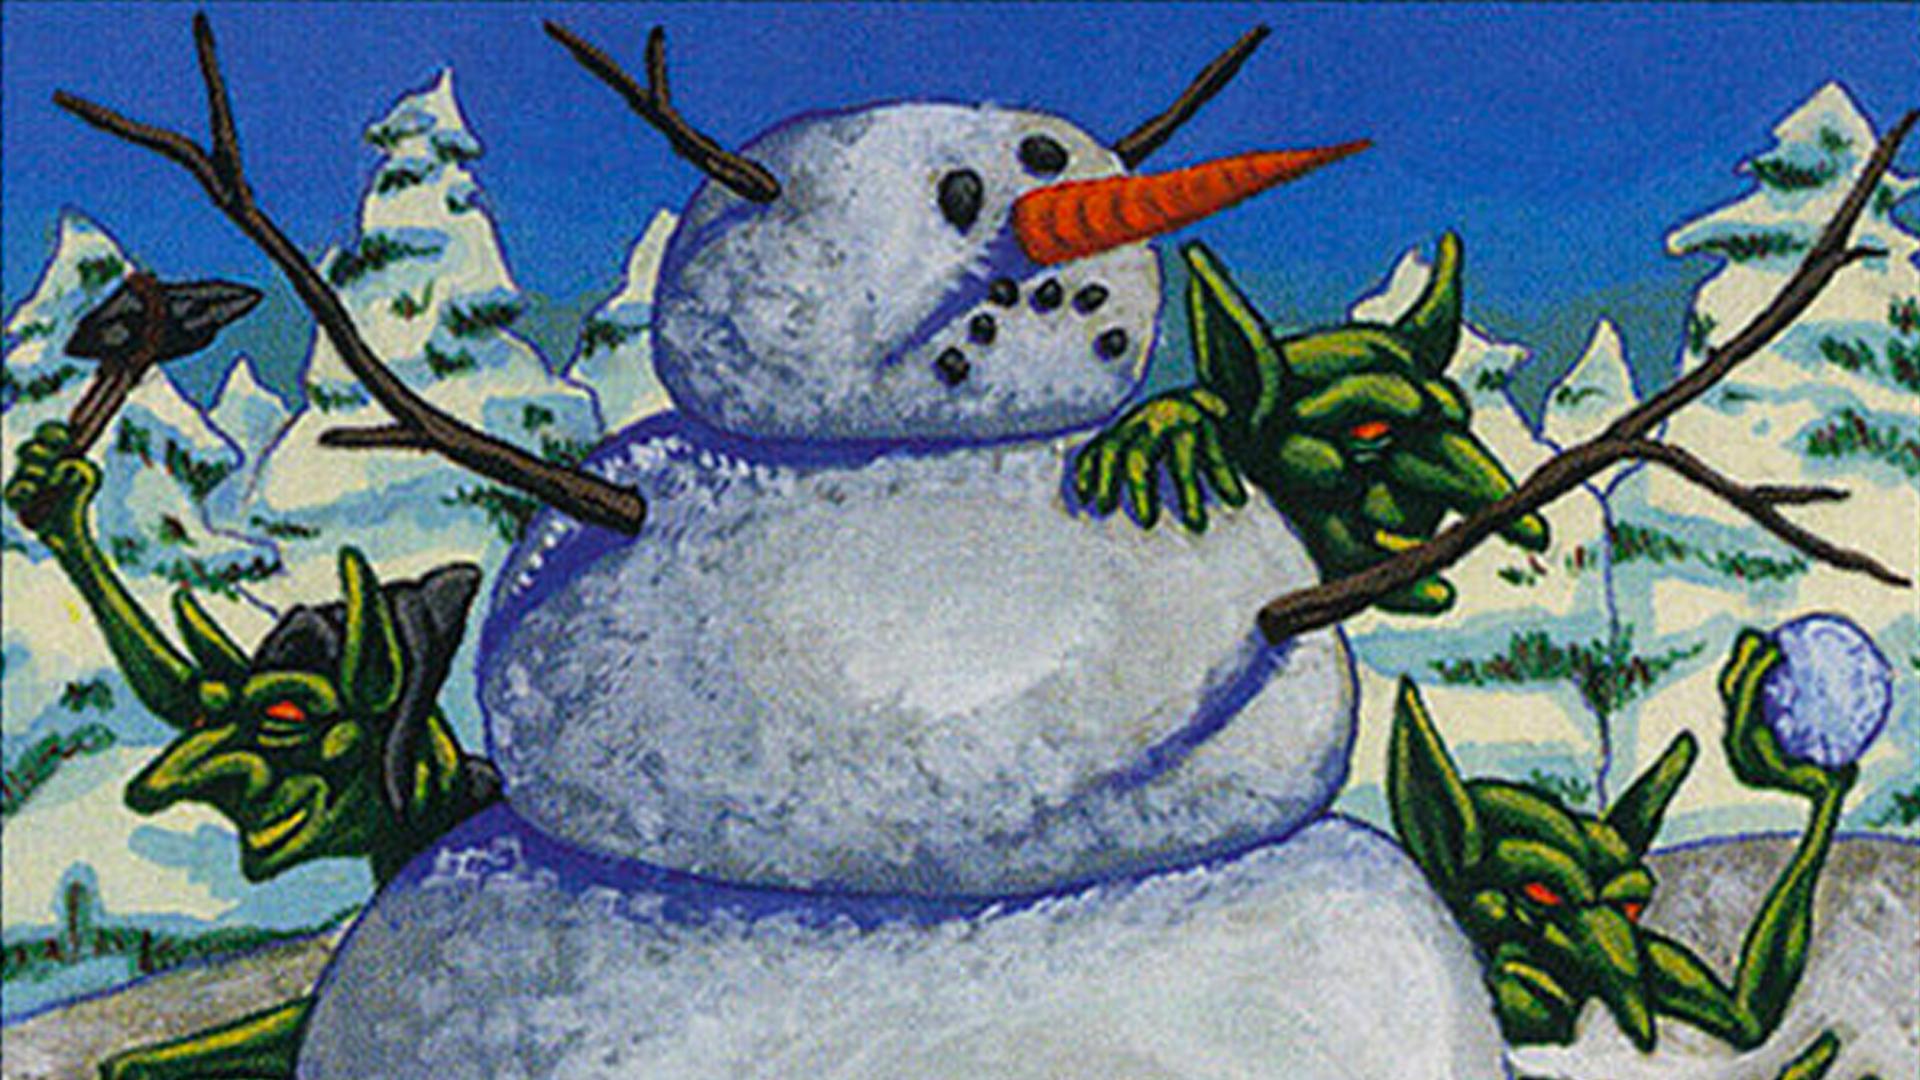 mtg-christmas-card-goblin-snowman-artwork.png